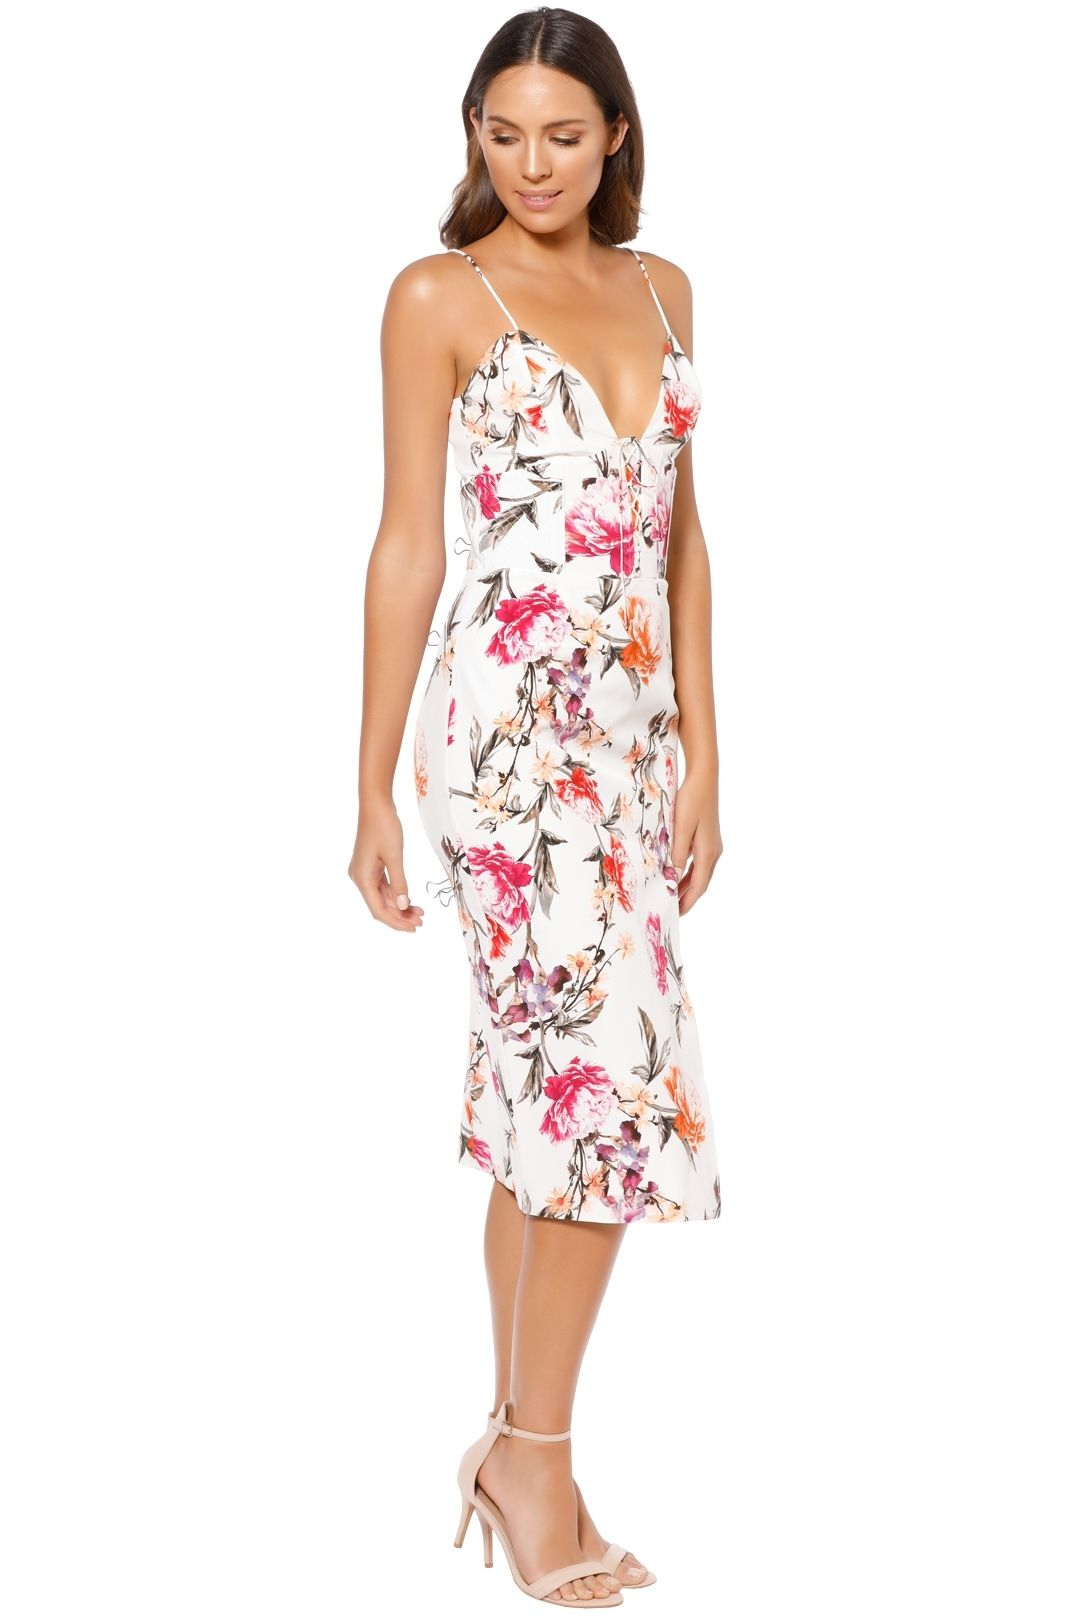 Nicholas - Lucile Floral Corset Bra Dress - Ivory - Side